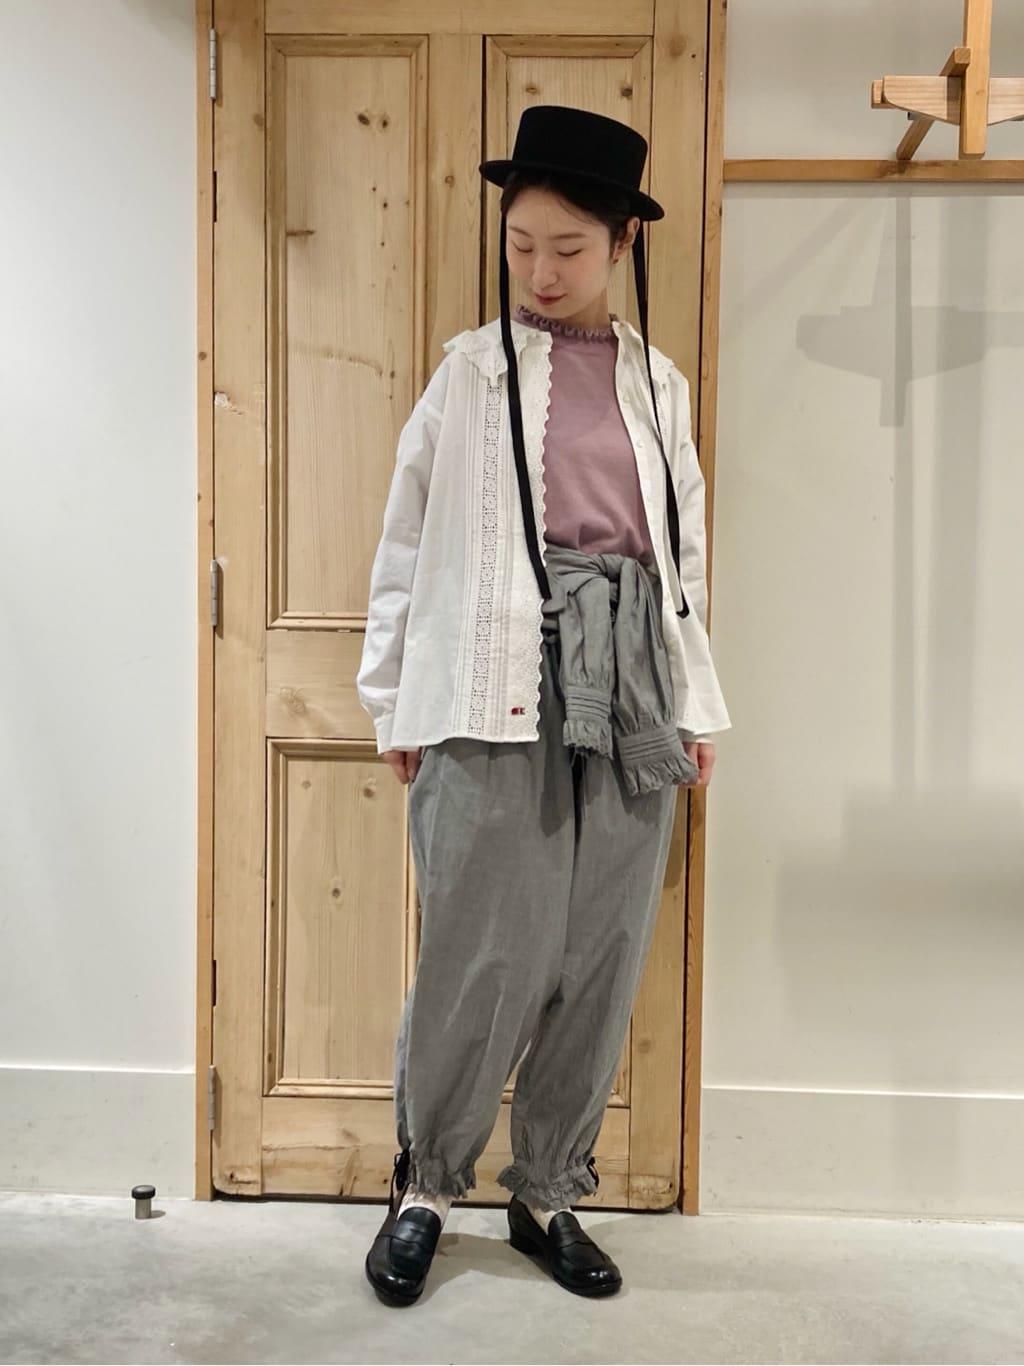 Malle chambre de charme 調布パルコ 身長:162cm 2021.10.14